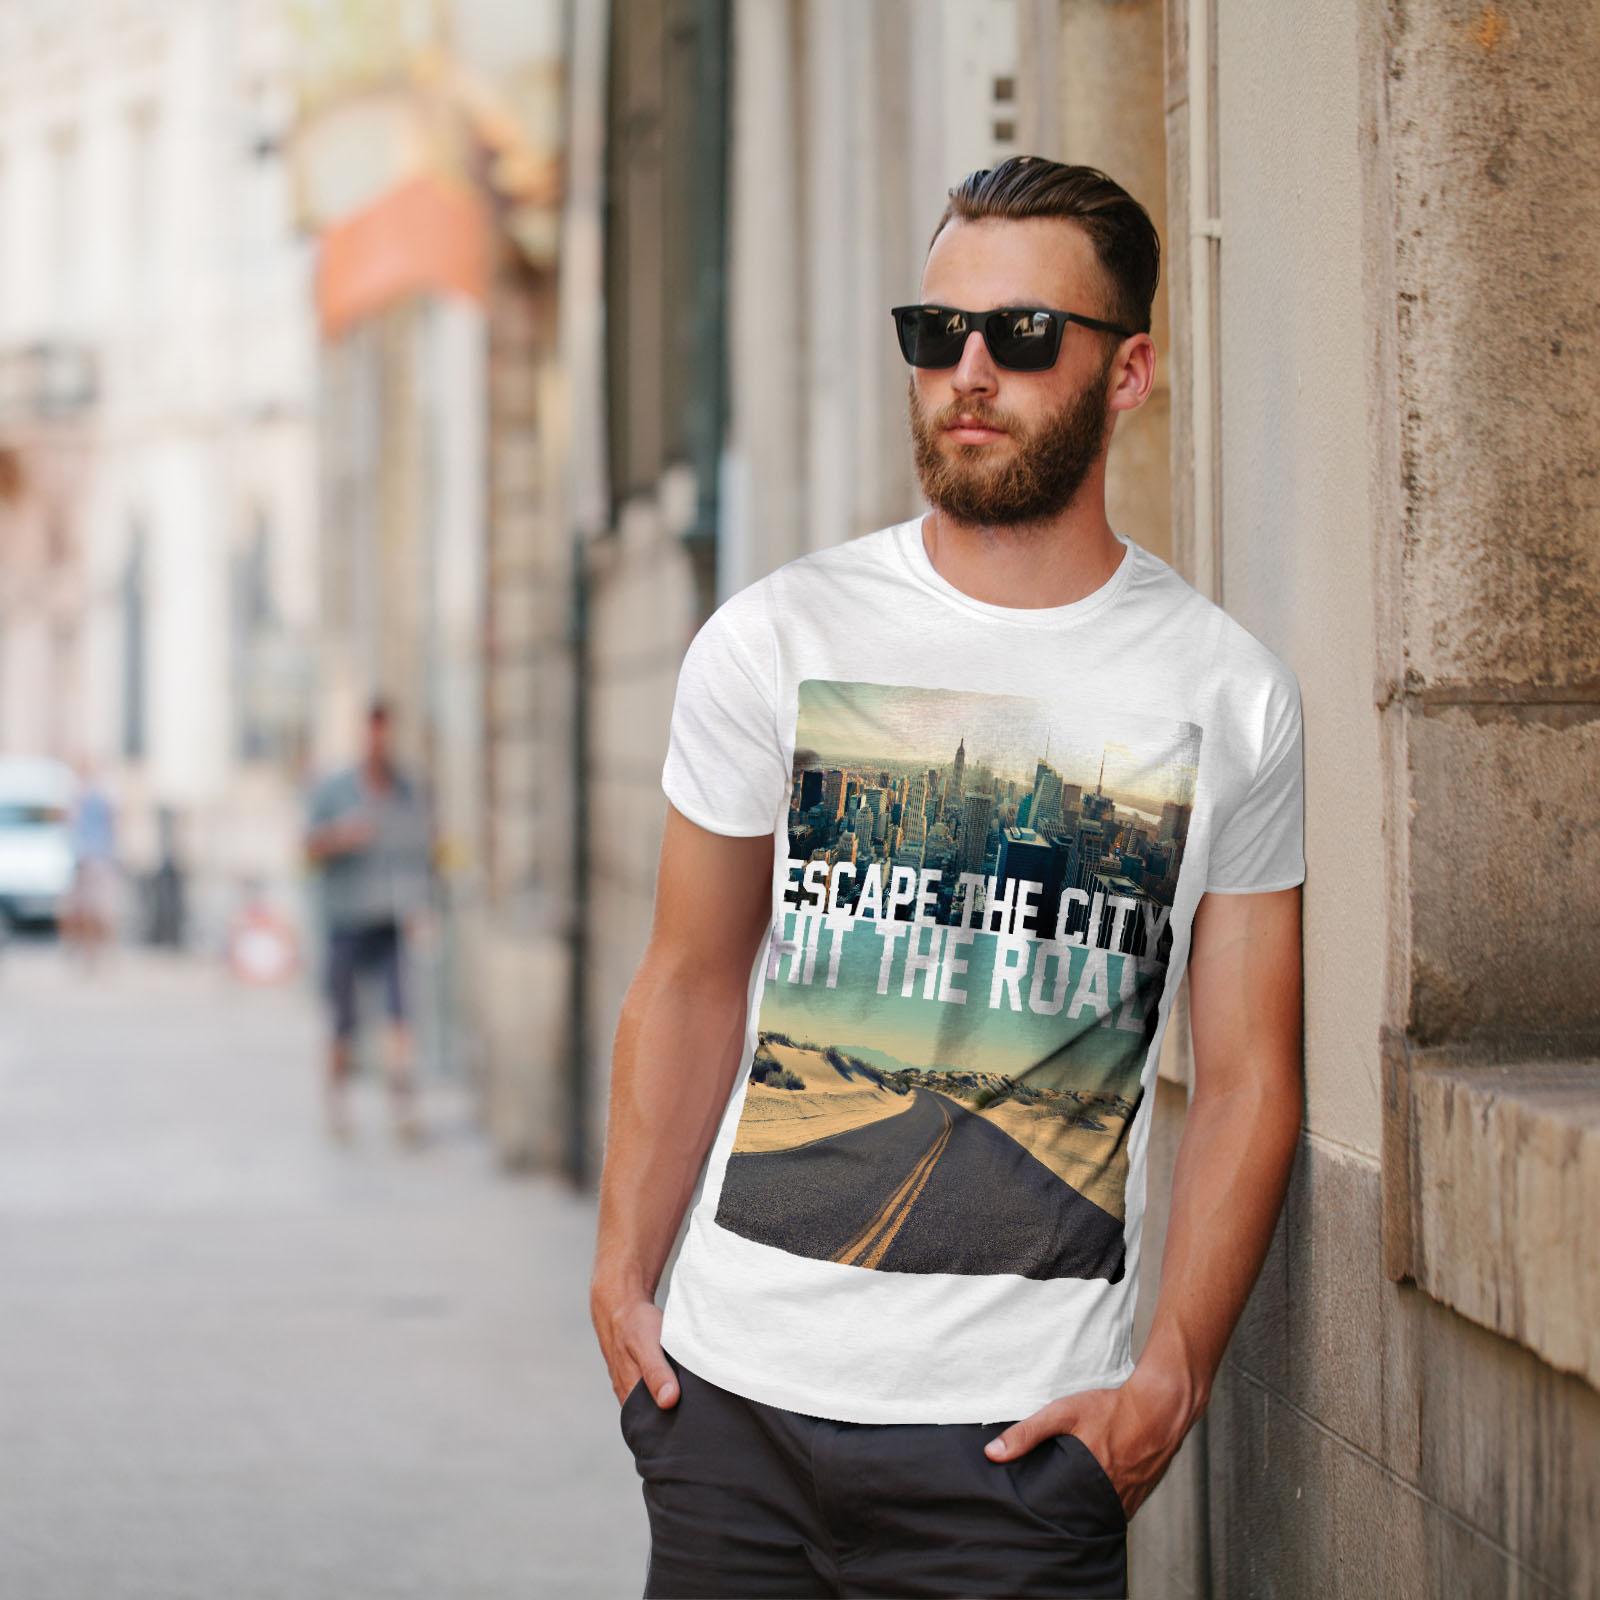 Wellcoda-Escape-The-City-Herren-T-Shirt-Lifestyle-Grafikdesign-Printed-Tee Indexbild 11